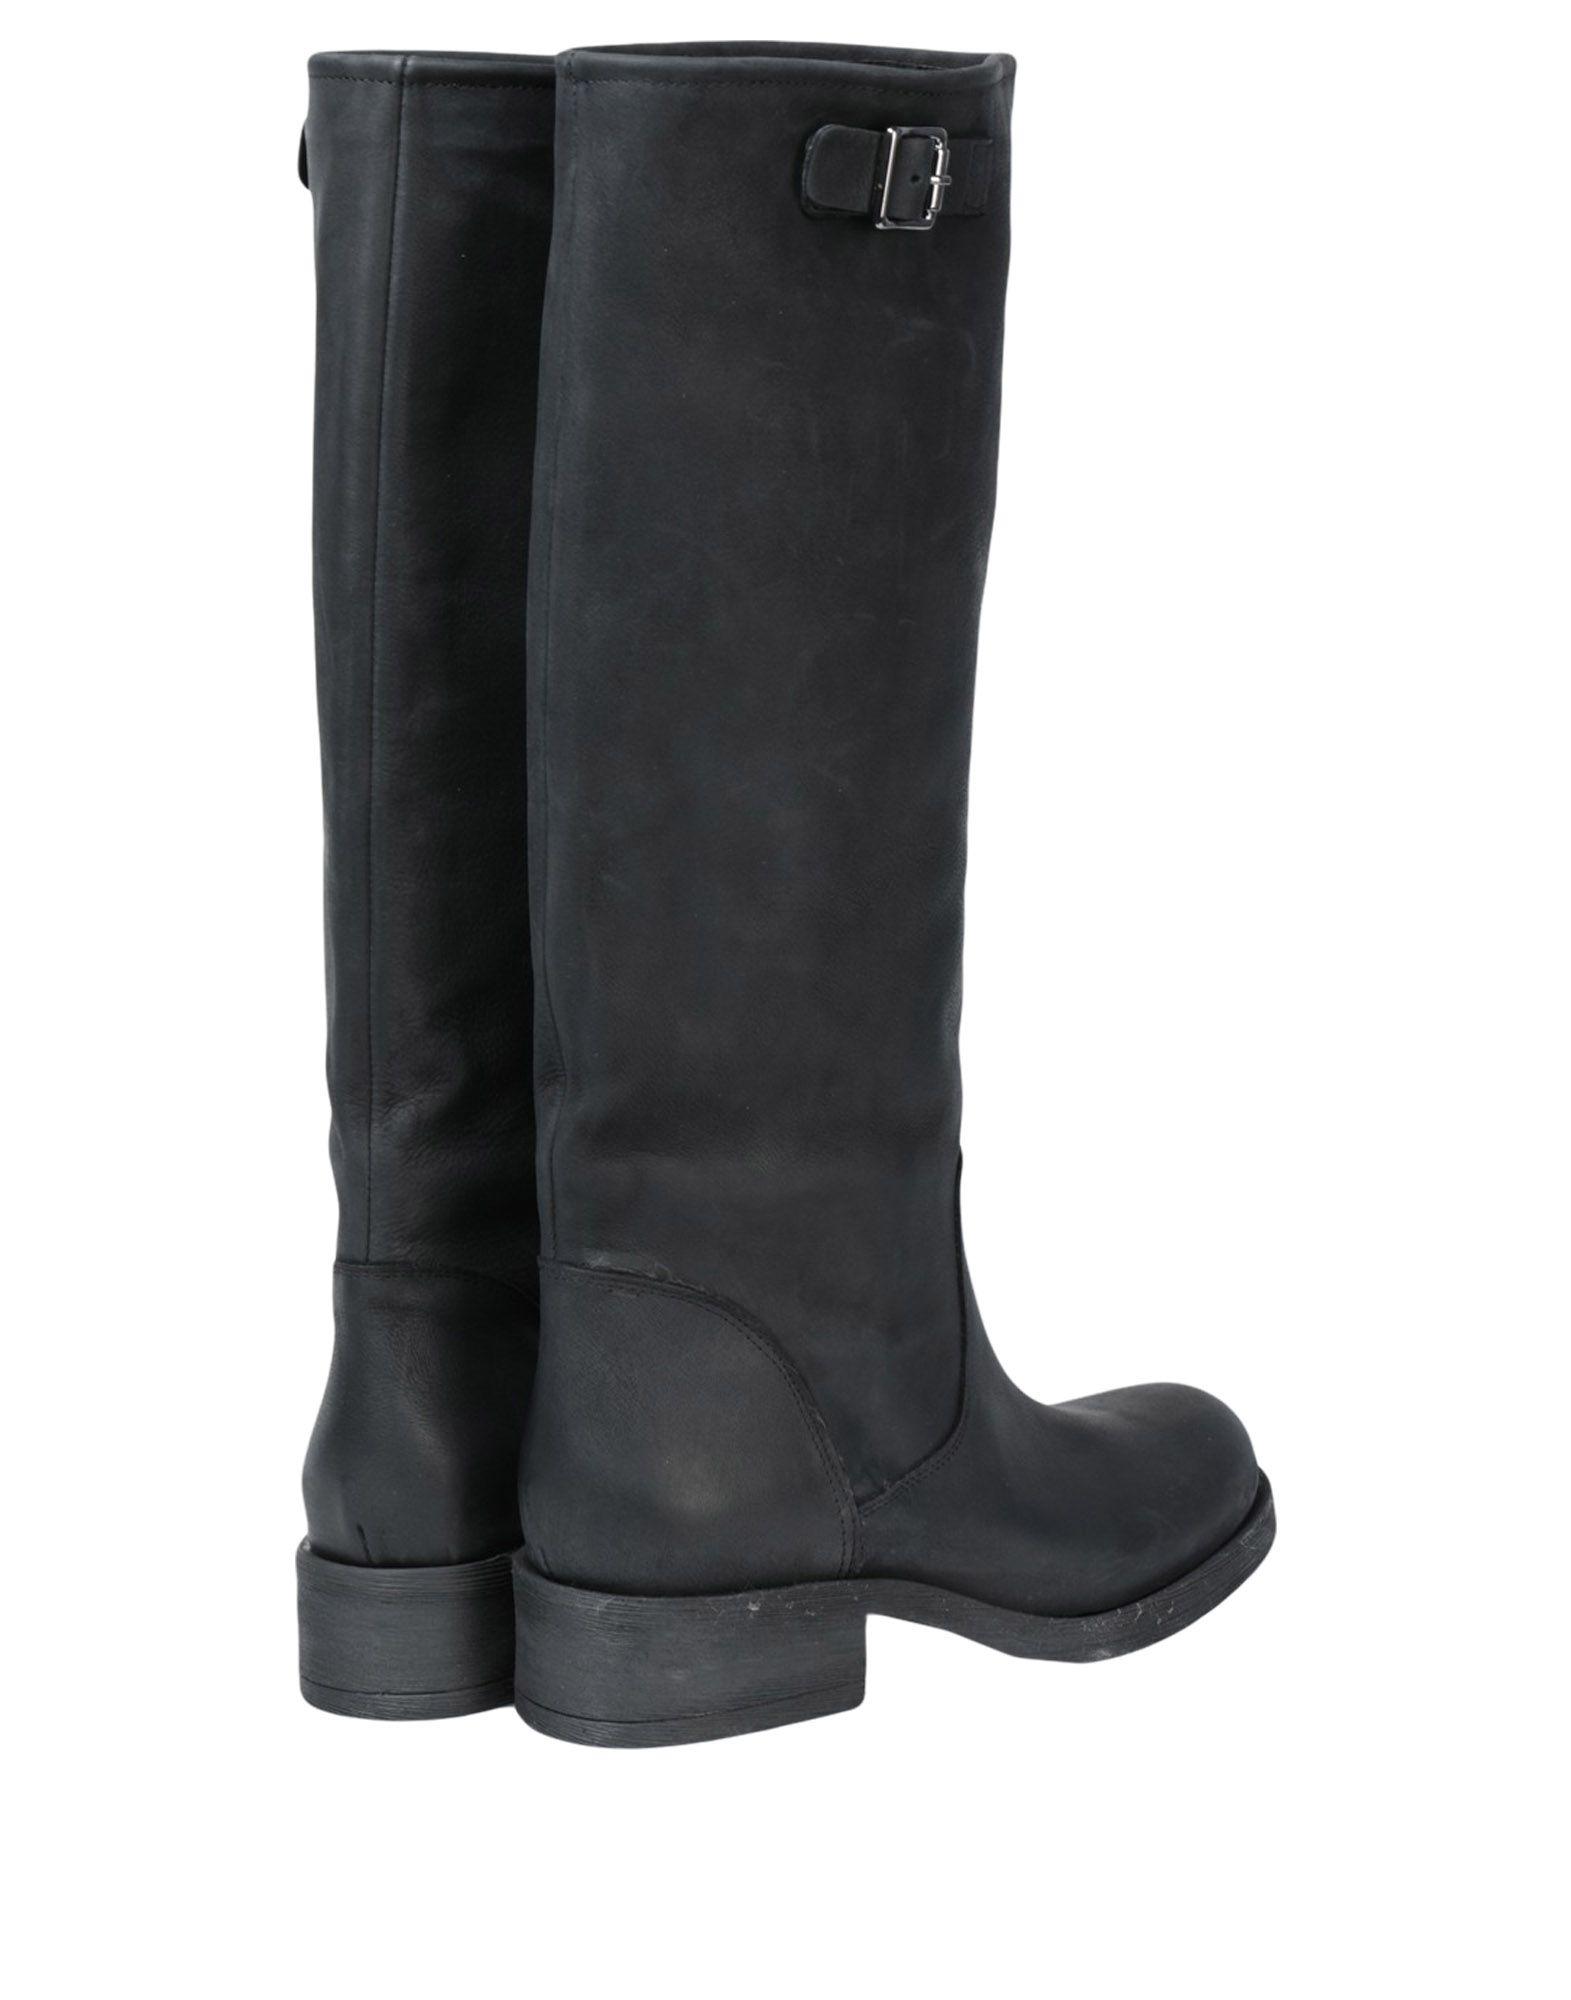 Get Damen It Stiefel Damen Get  11512384BL Neue Schuhe abb445